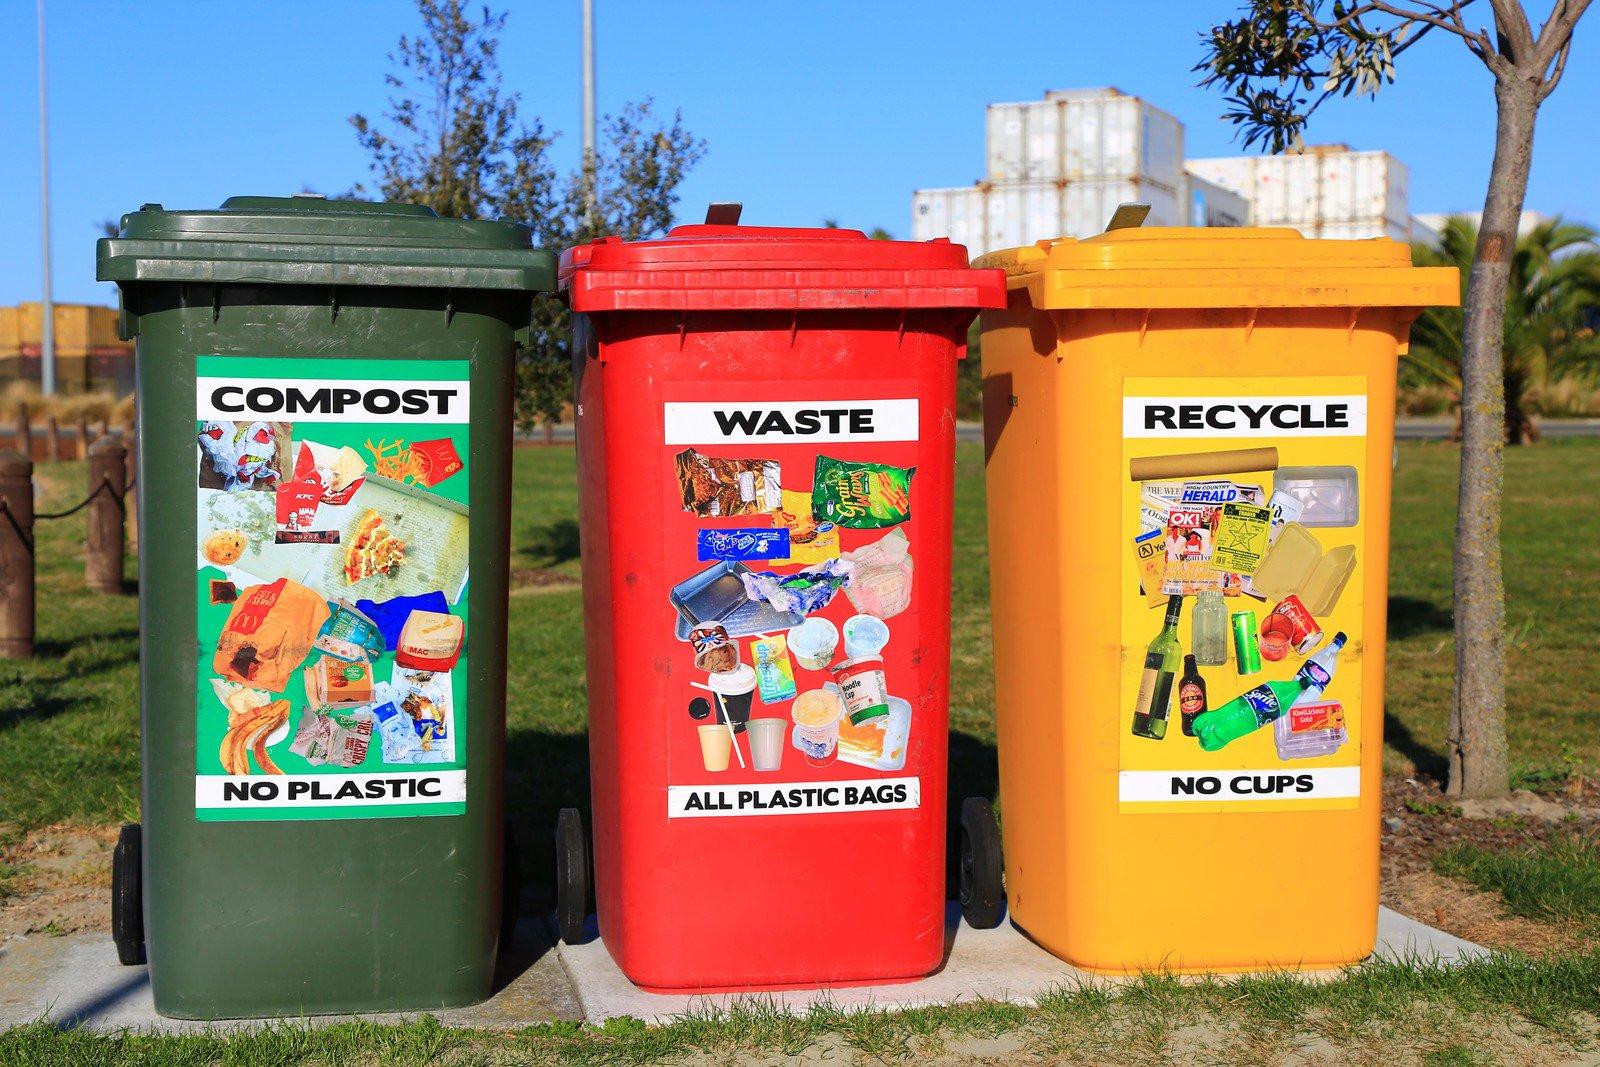 compost- embed 1.jpg